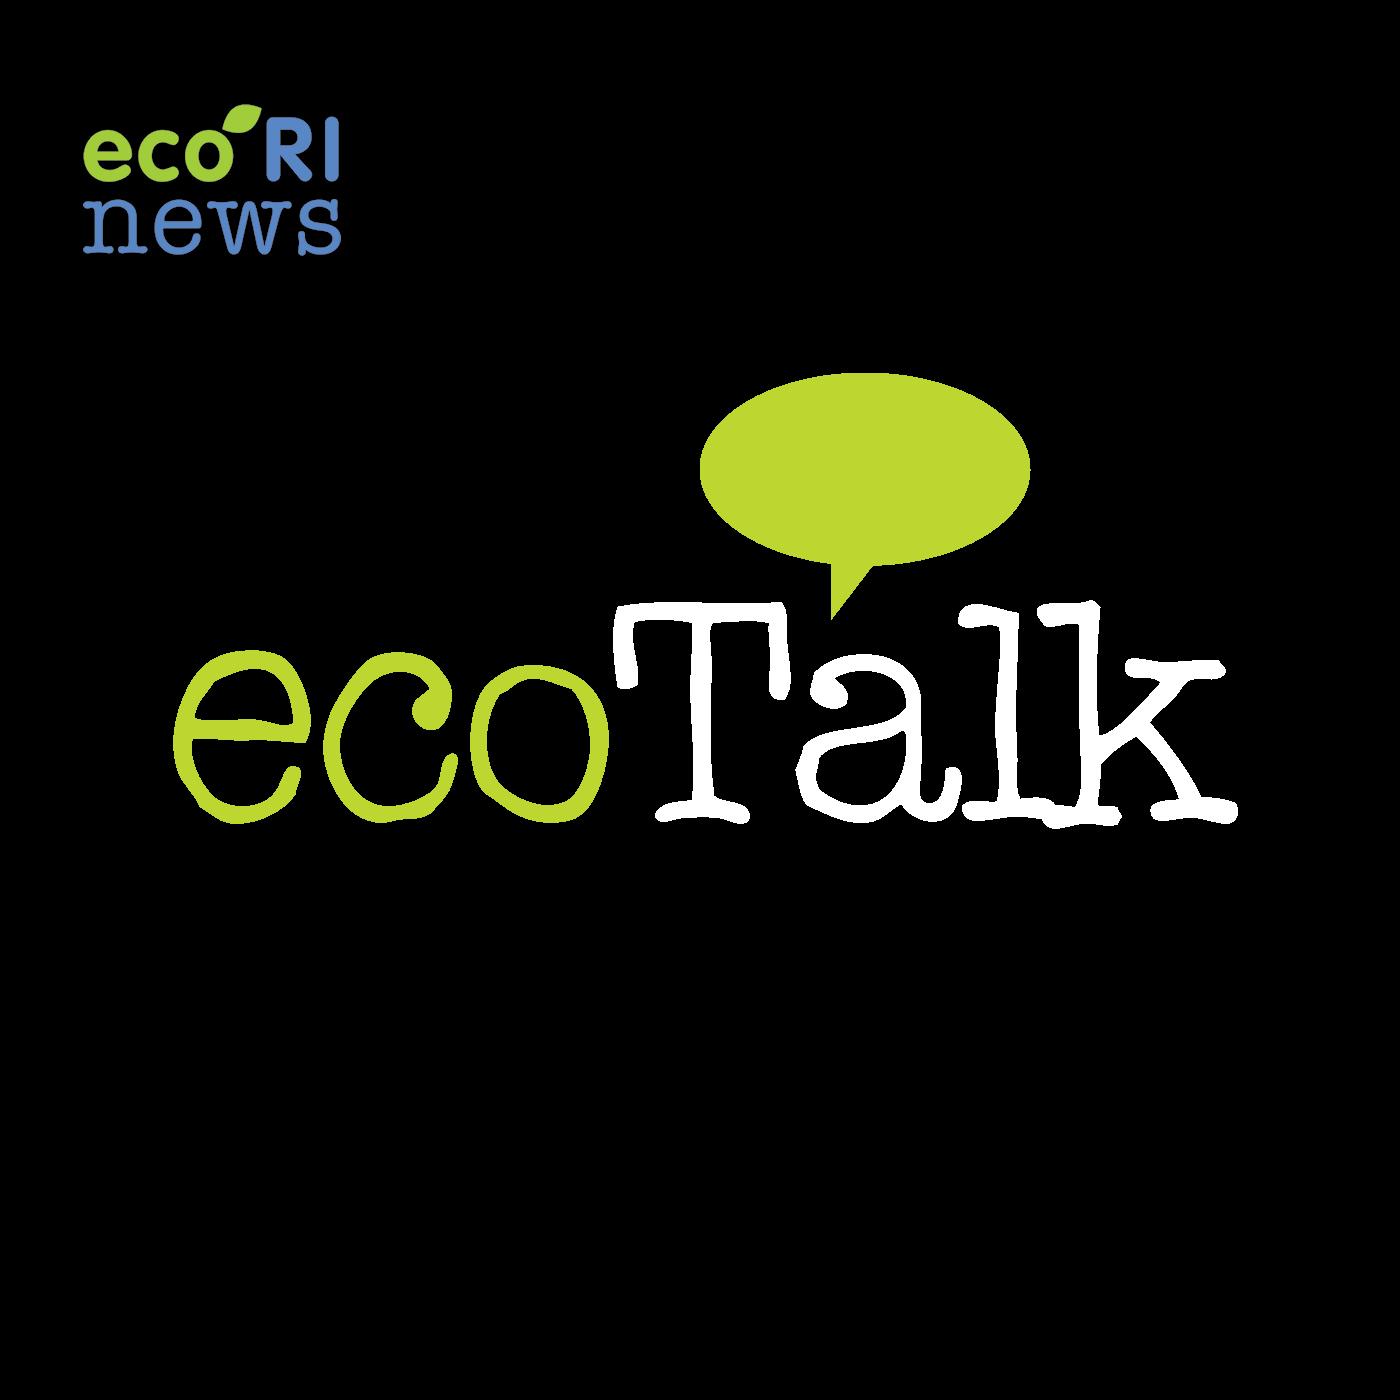 ecoTalk